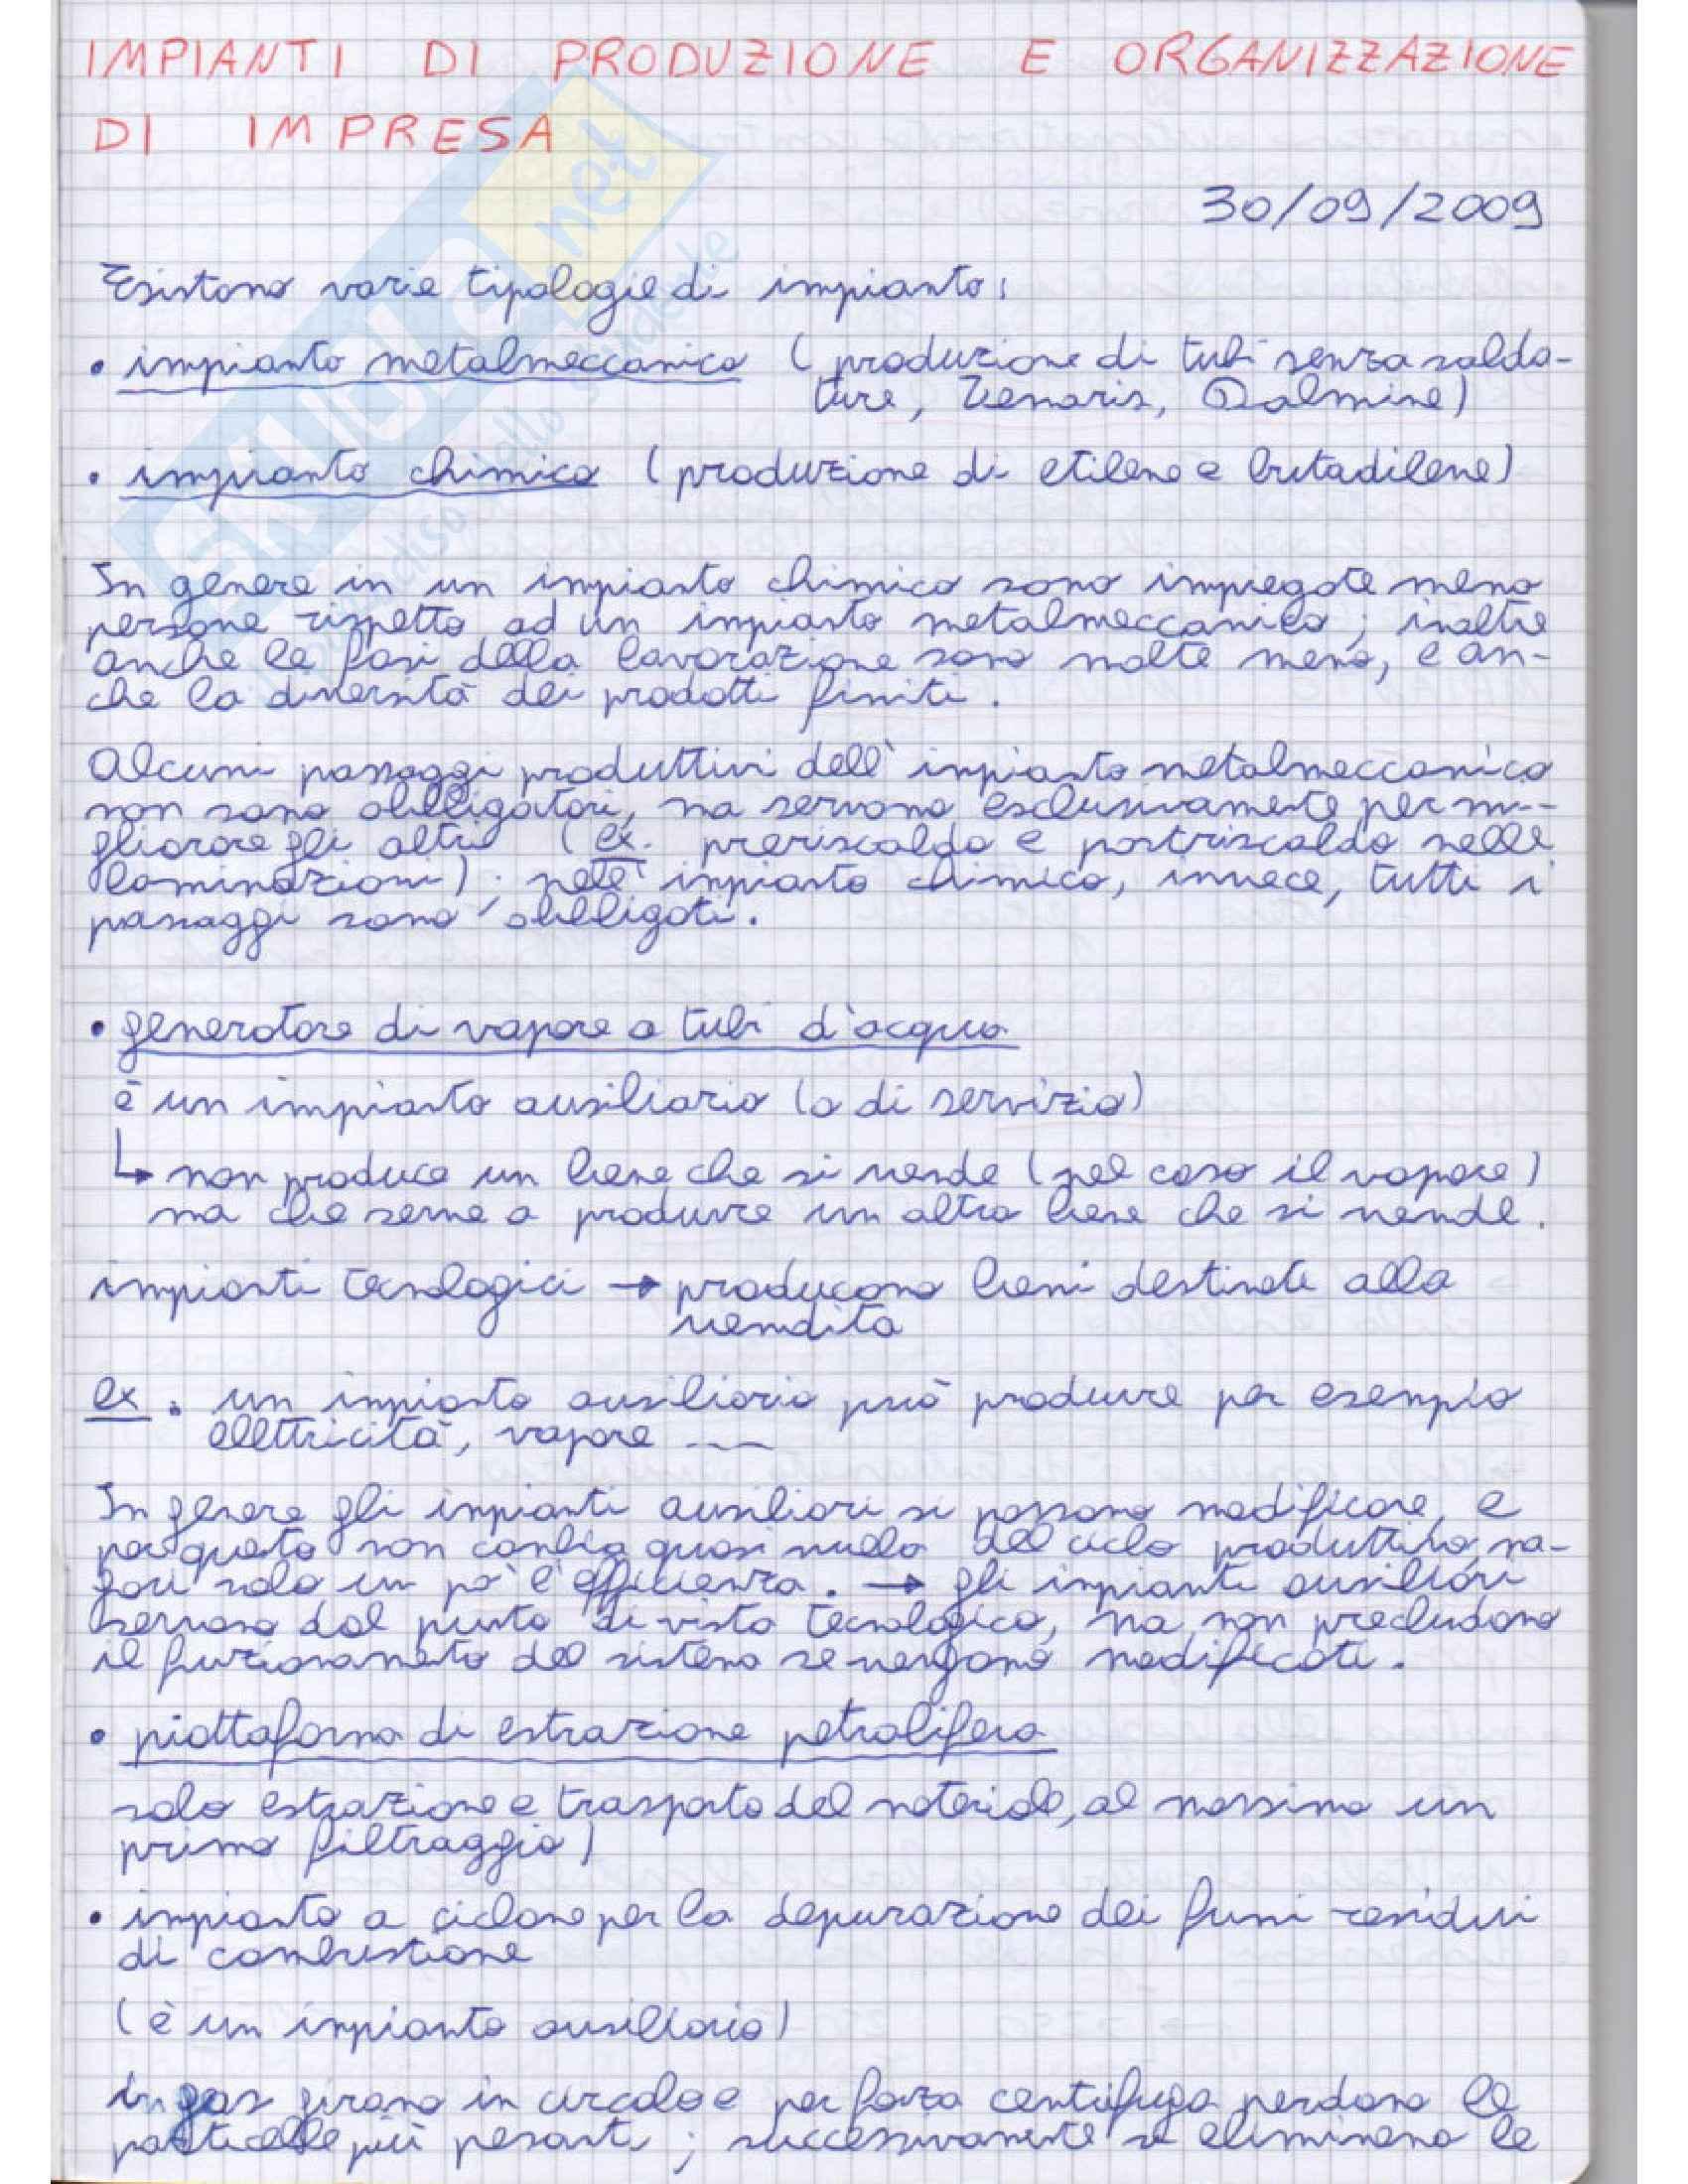 Impianti di produzone e organizzazione di impresa - Appunti